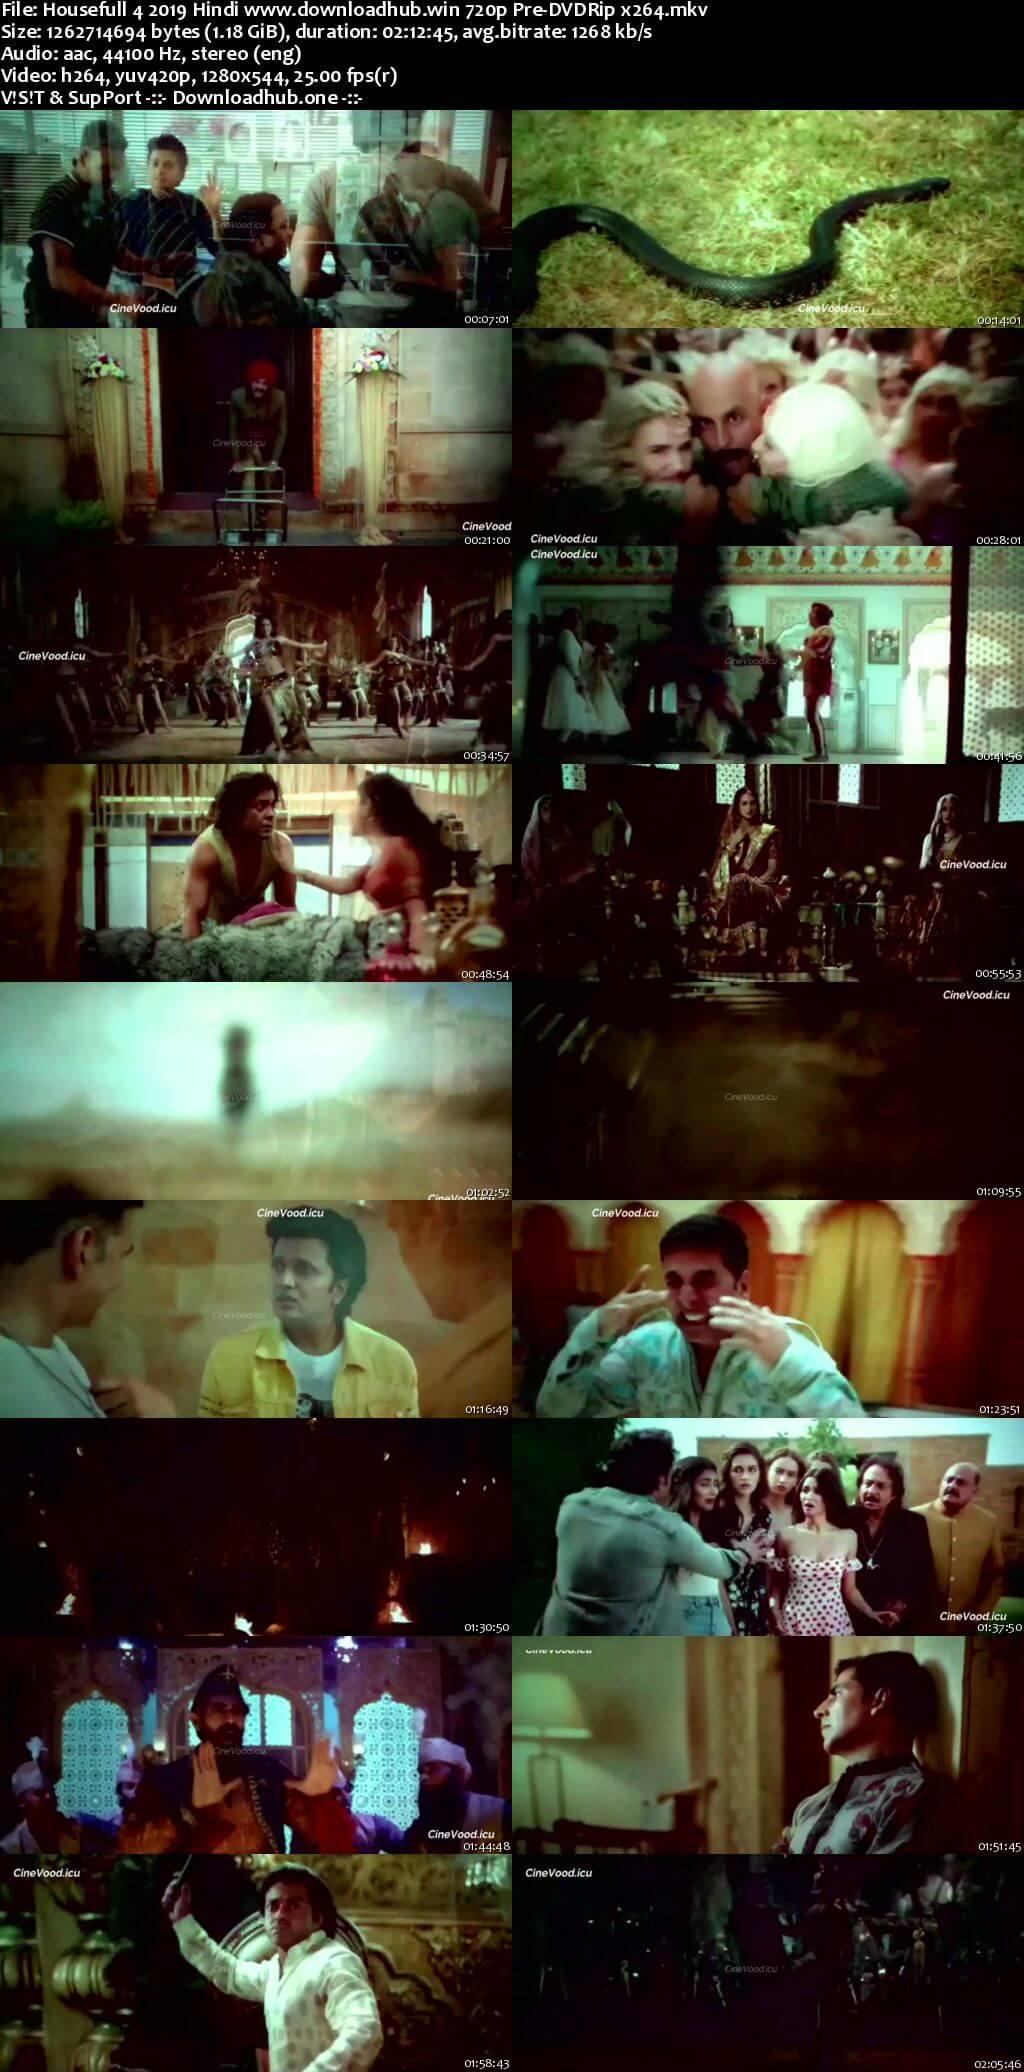 Housefull 4 2019 Hindi 720p 480p Pre-DVDRip x264